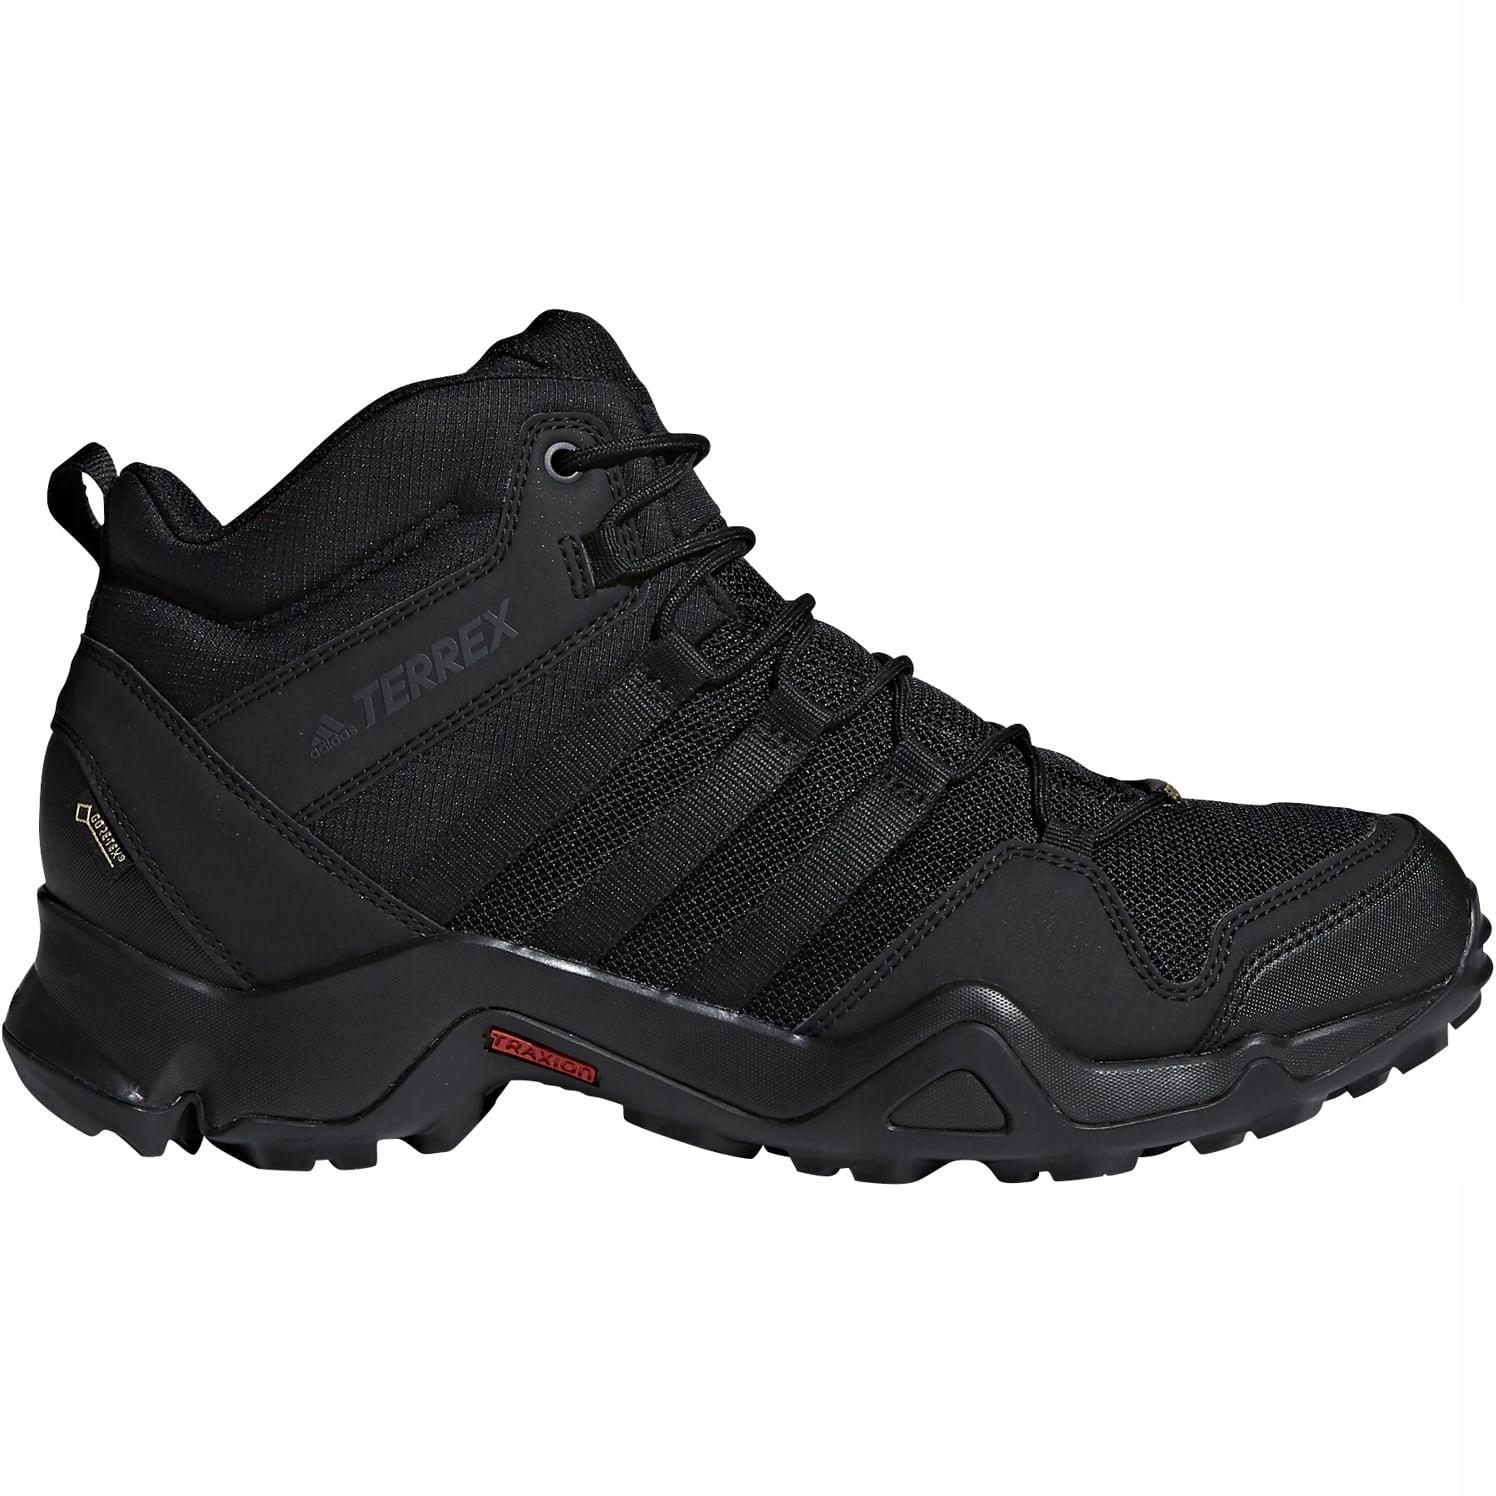 buty trekkingowe Adidas Terrex AX2R Mid GTX CM7697, męskie, Czarne